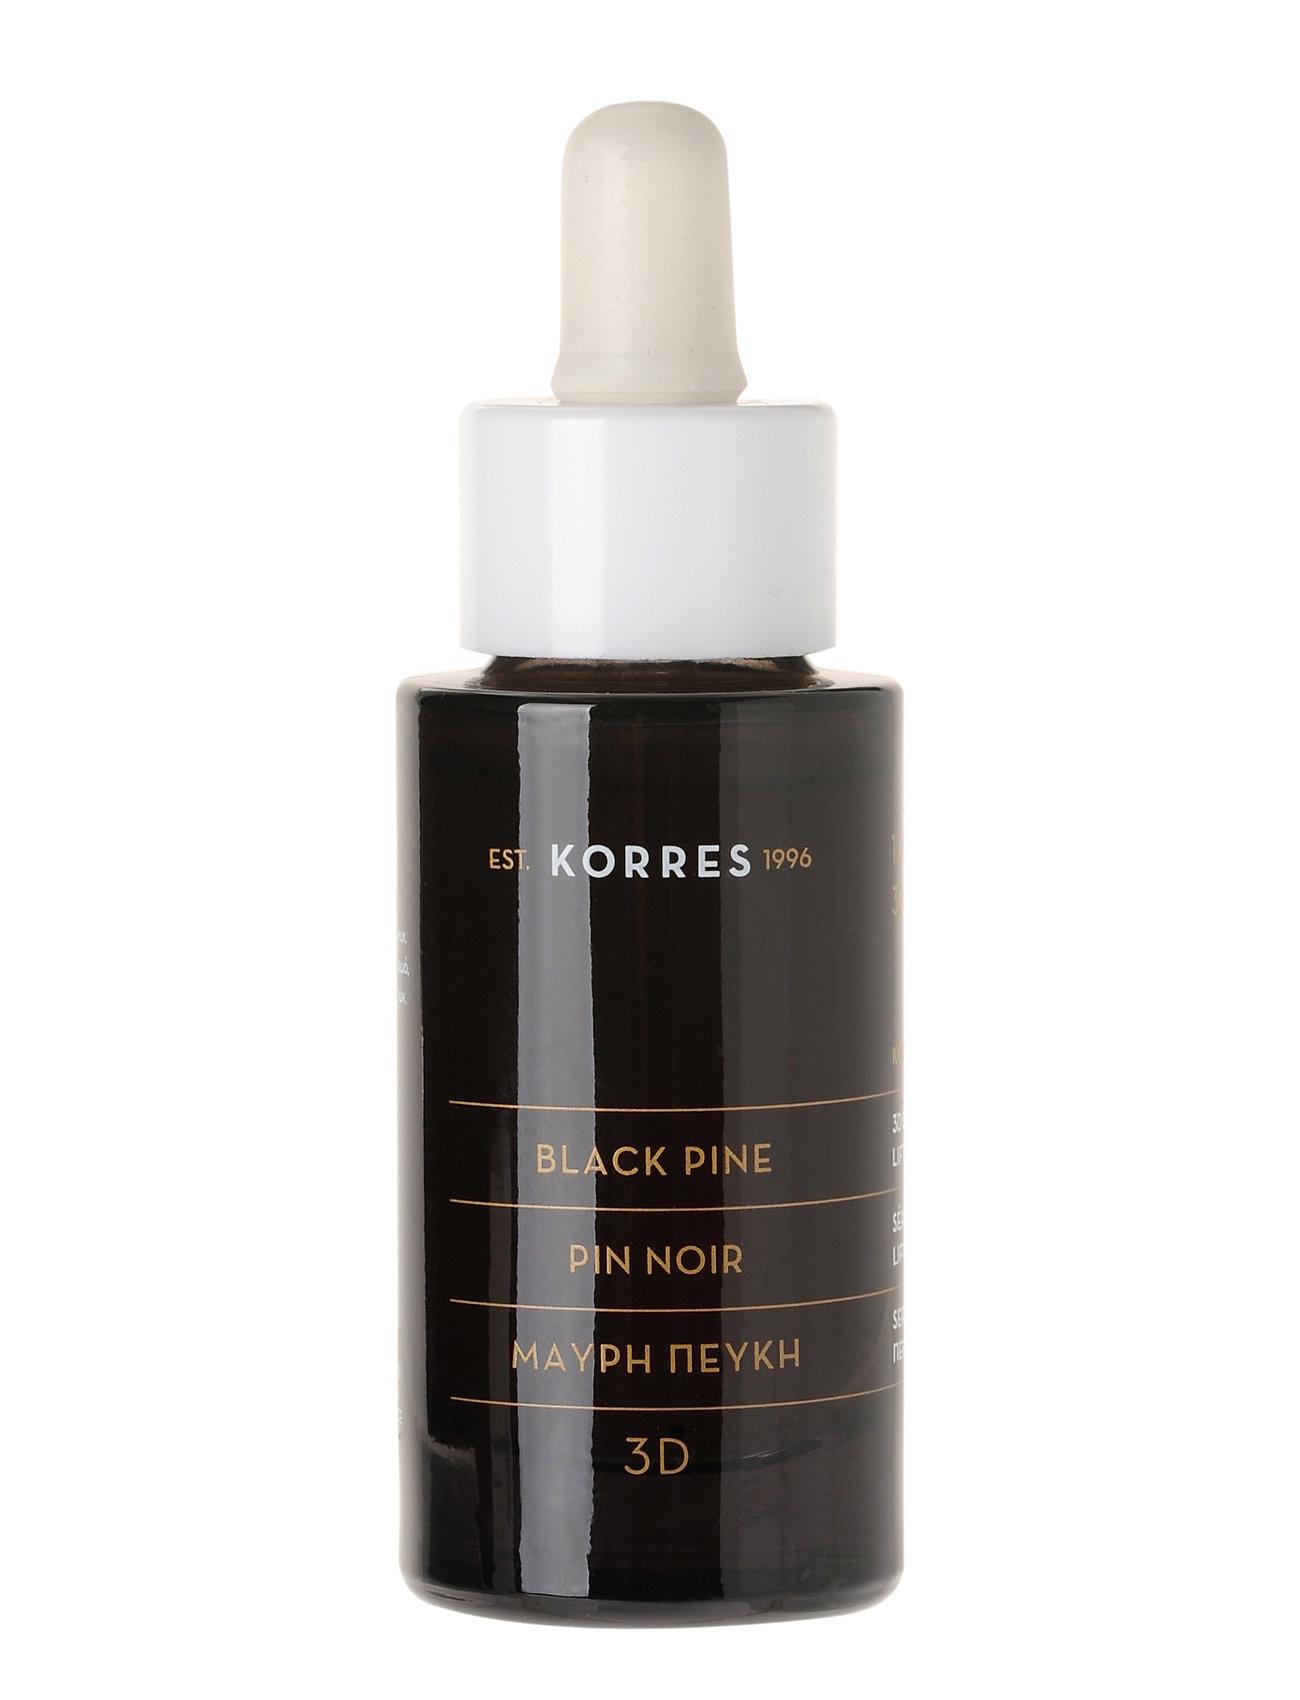 korres – Black pine face serum 30ml fra boozt.com dk